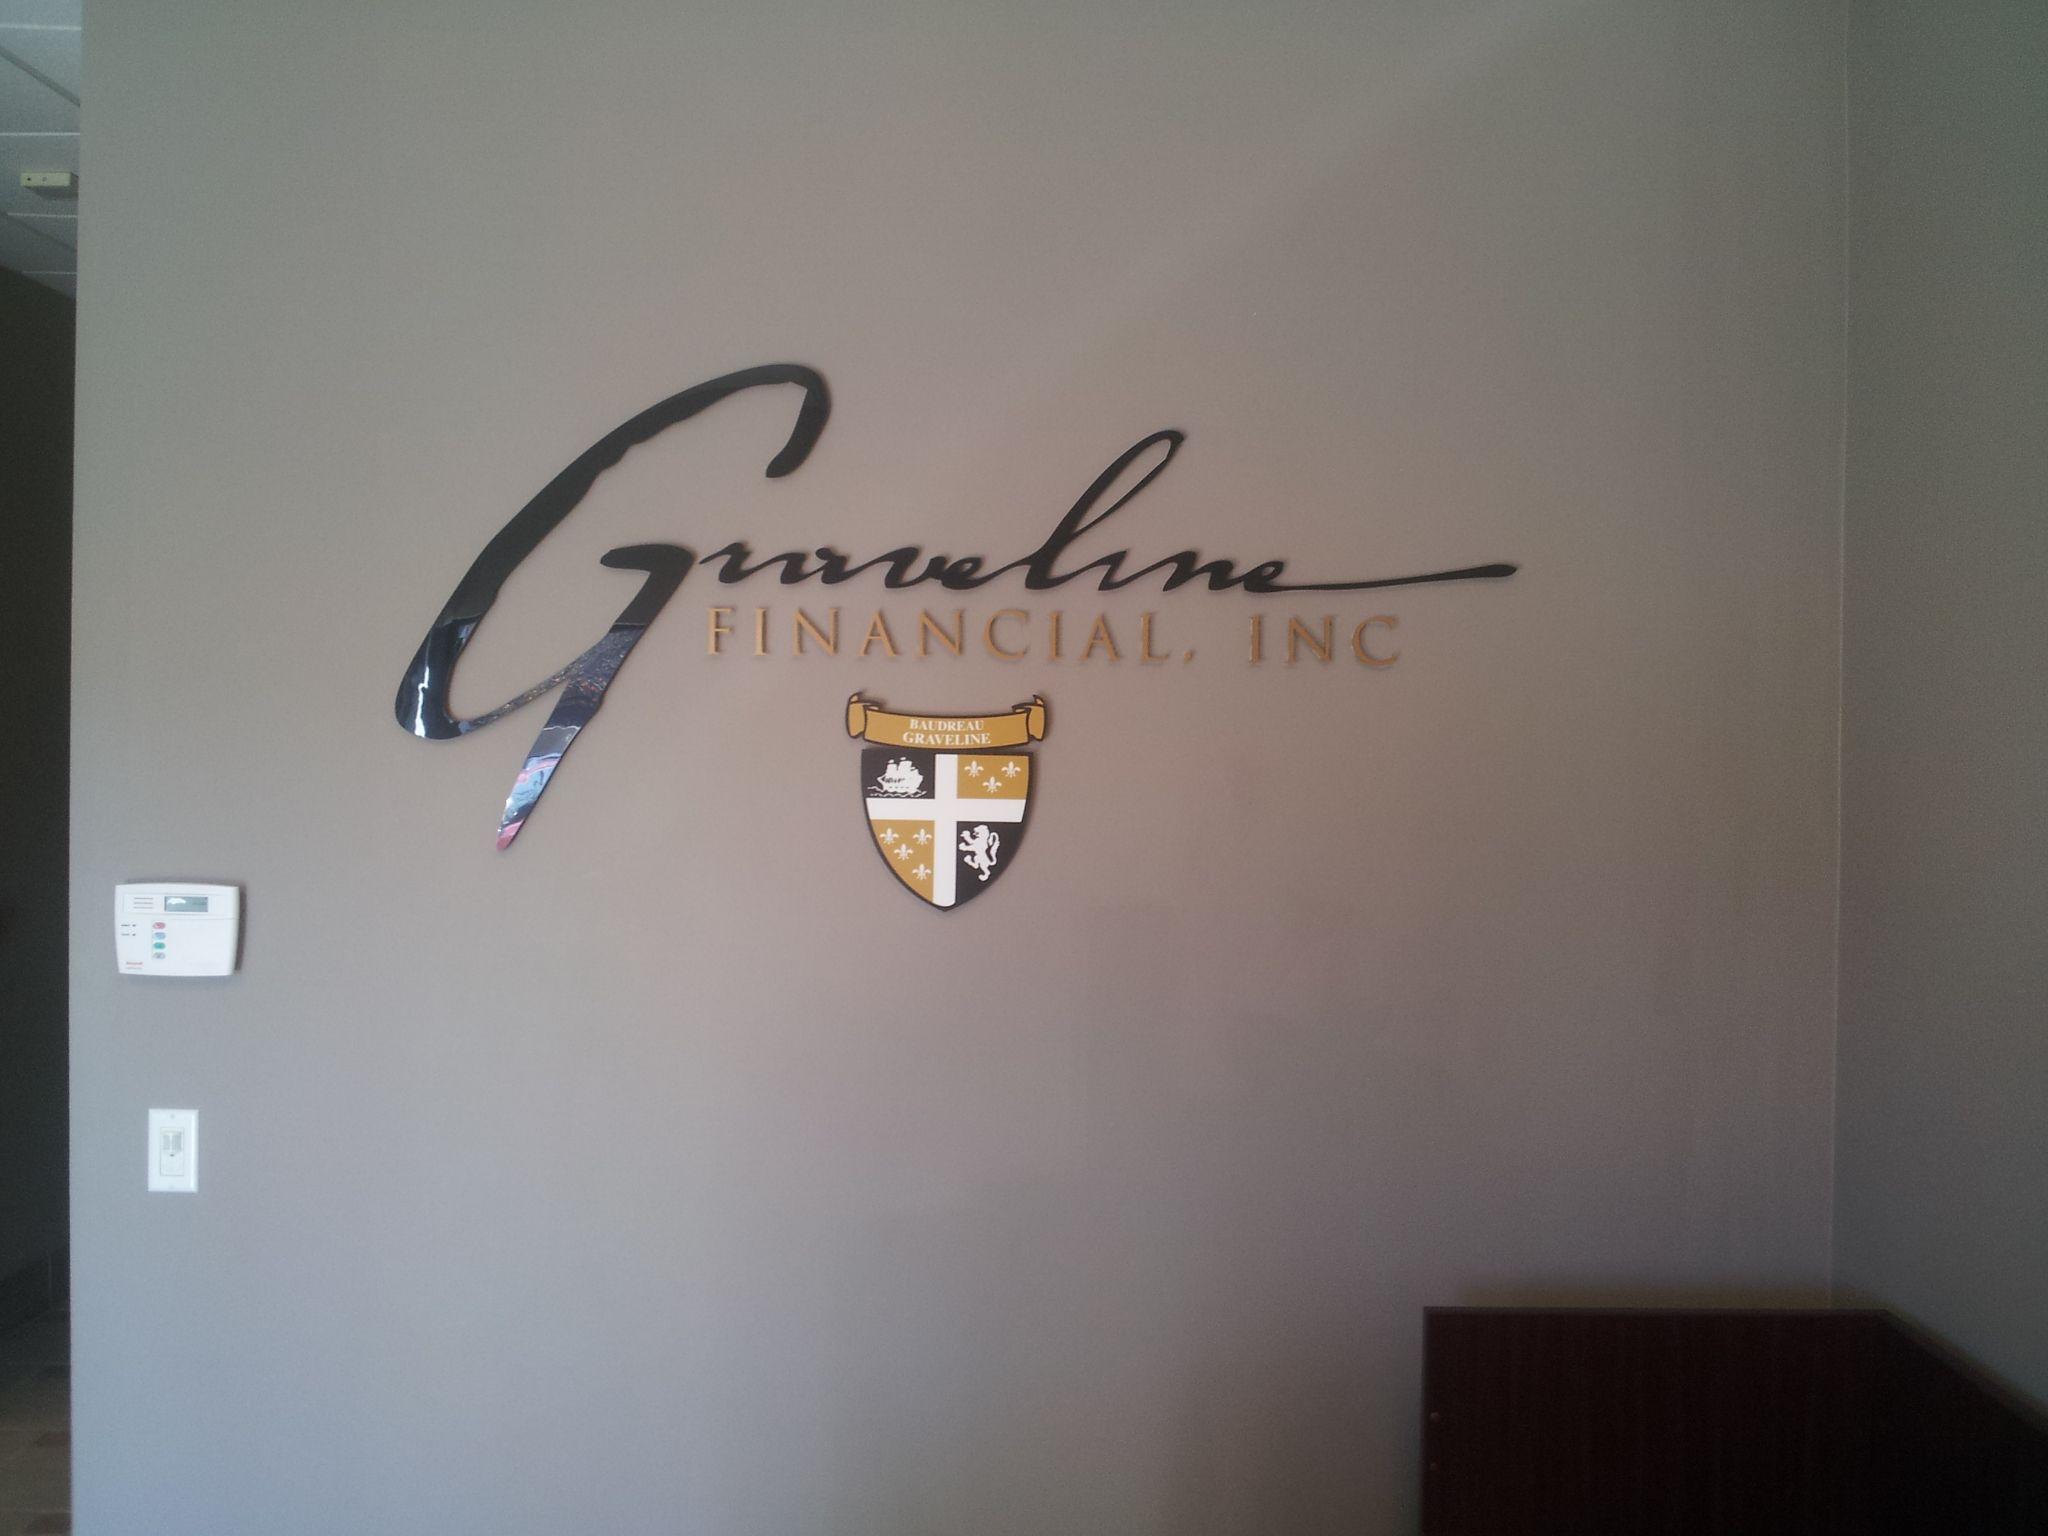 Graveline Financial